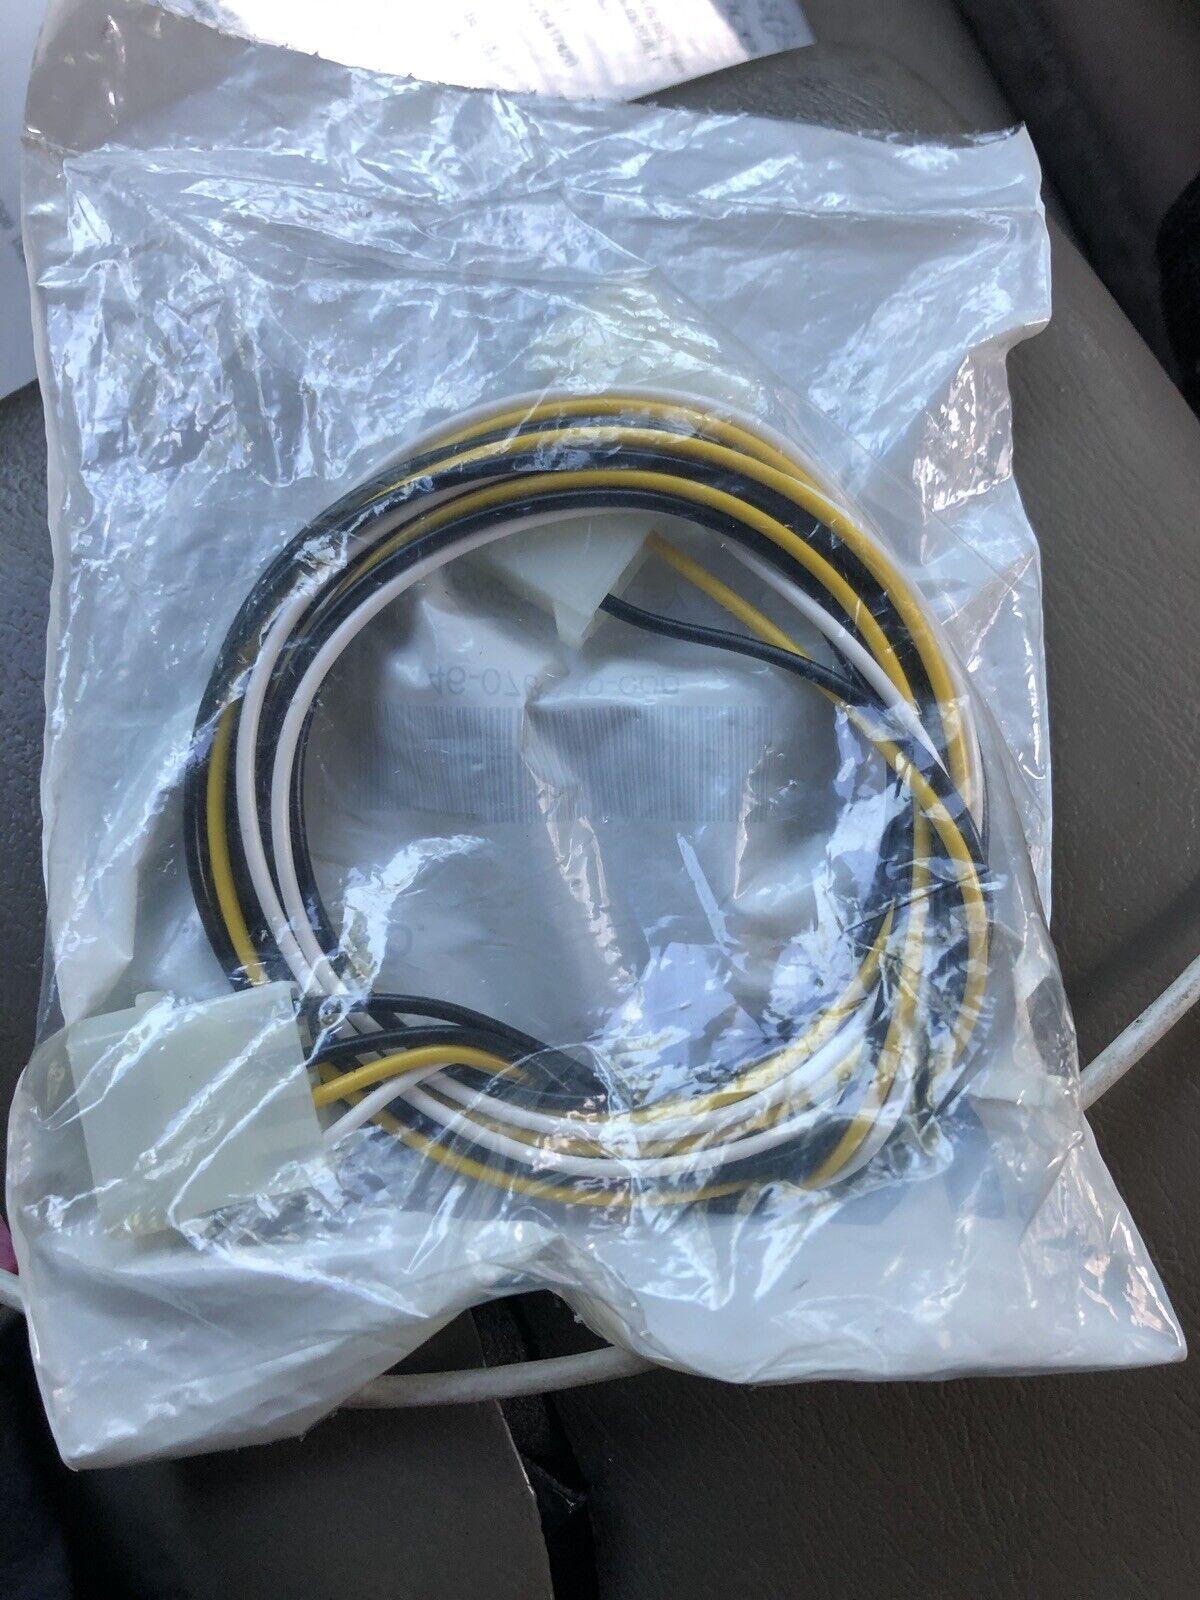 Whelen Alley Light Wiring Harness for 9m Edge LFL Liberty Patriot Lightbars  for sale online | eBayeBay